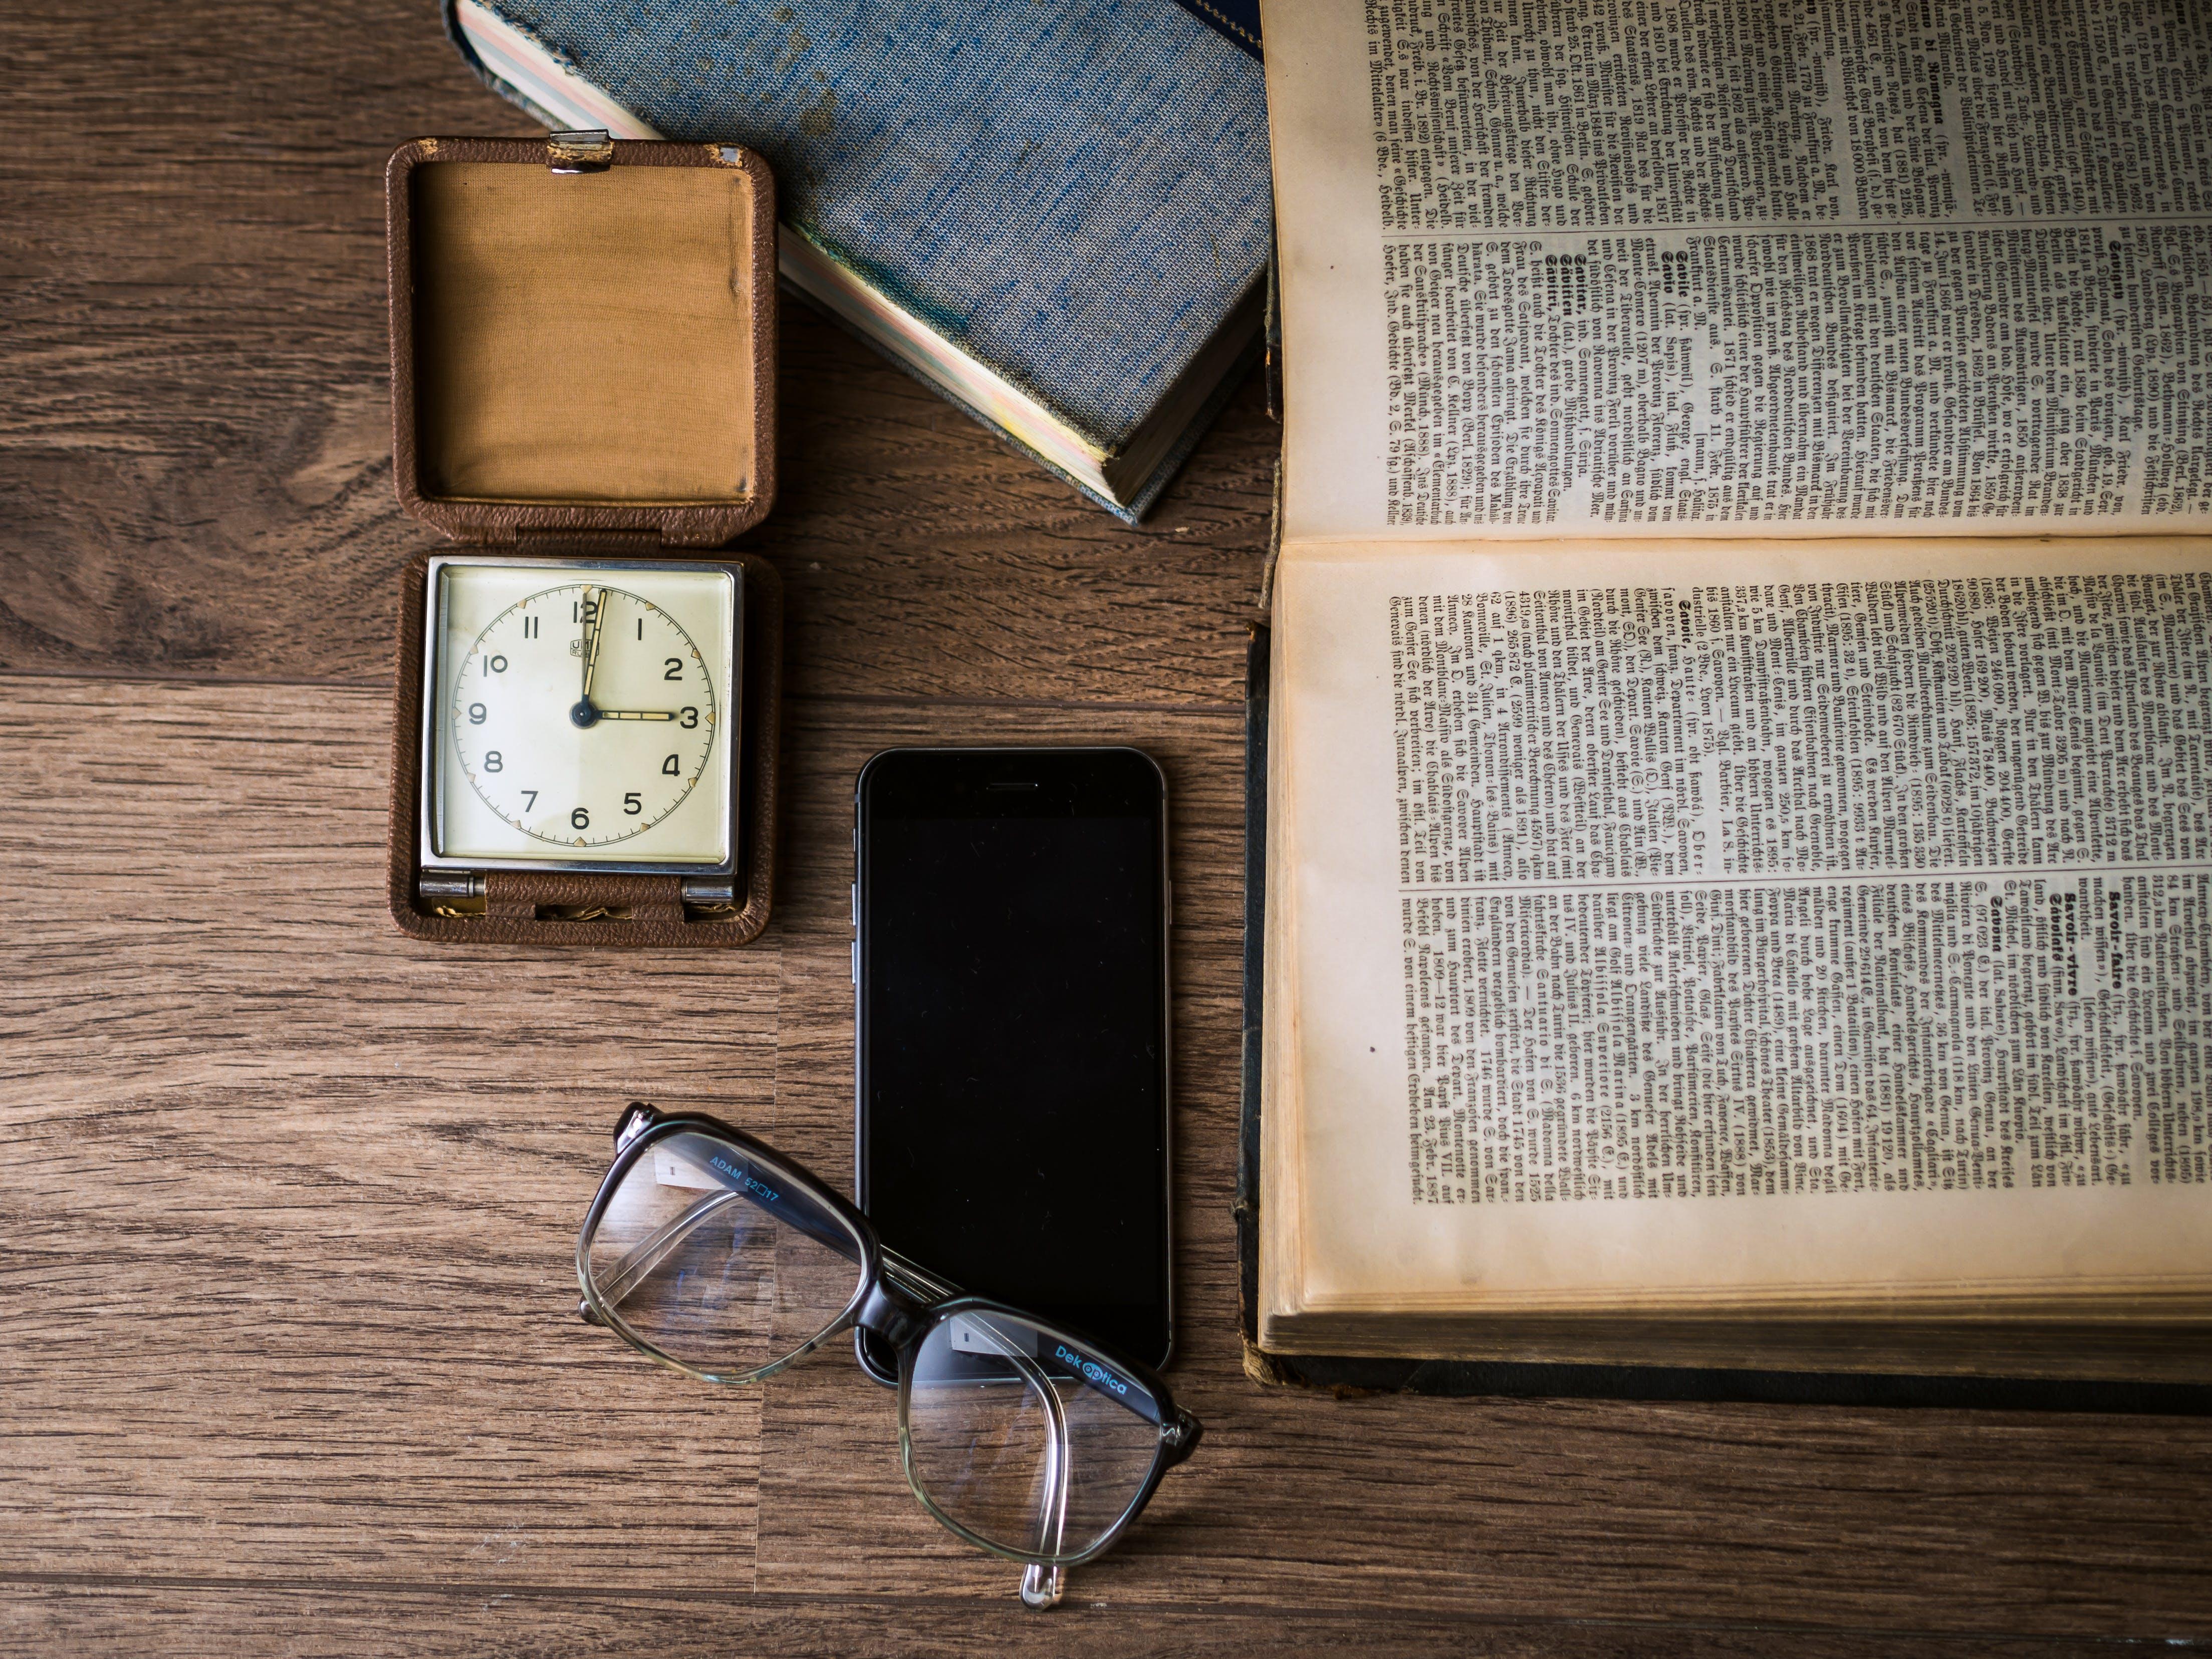 Black Framed Eyeglasses on Top of Black Smartphone Near Brown Square Analog Clock on Brown Wooden Surface